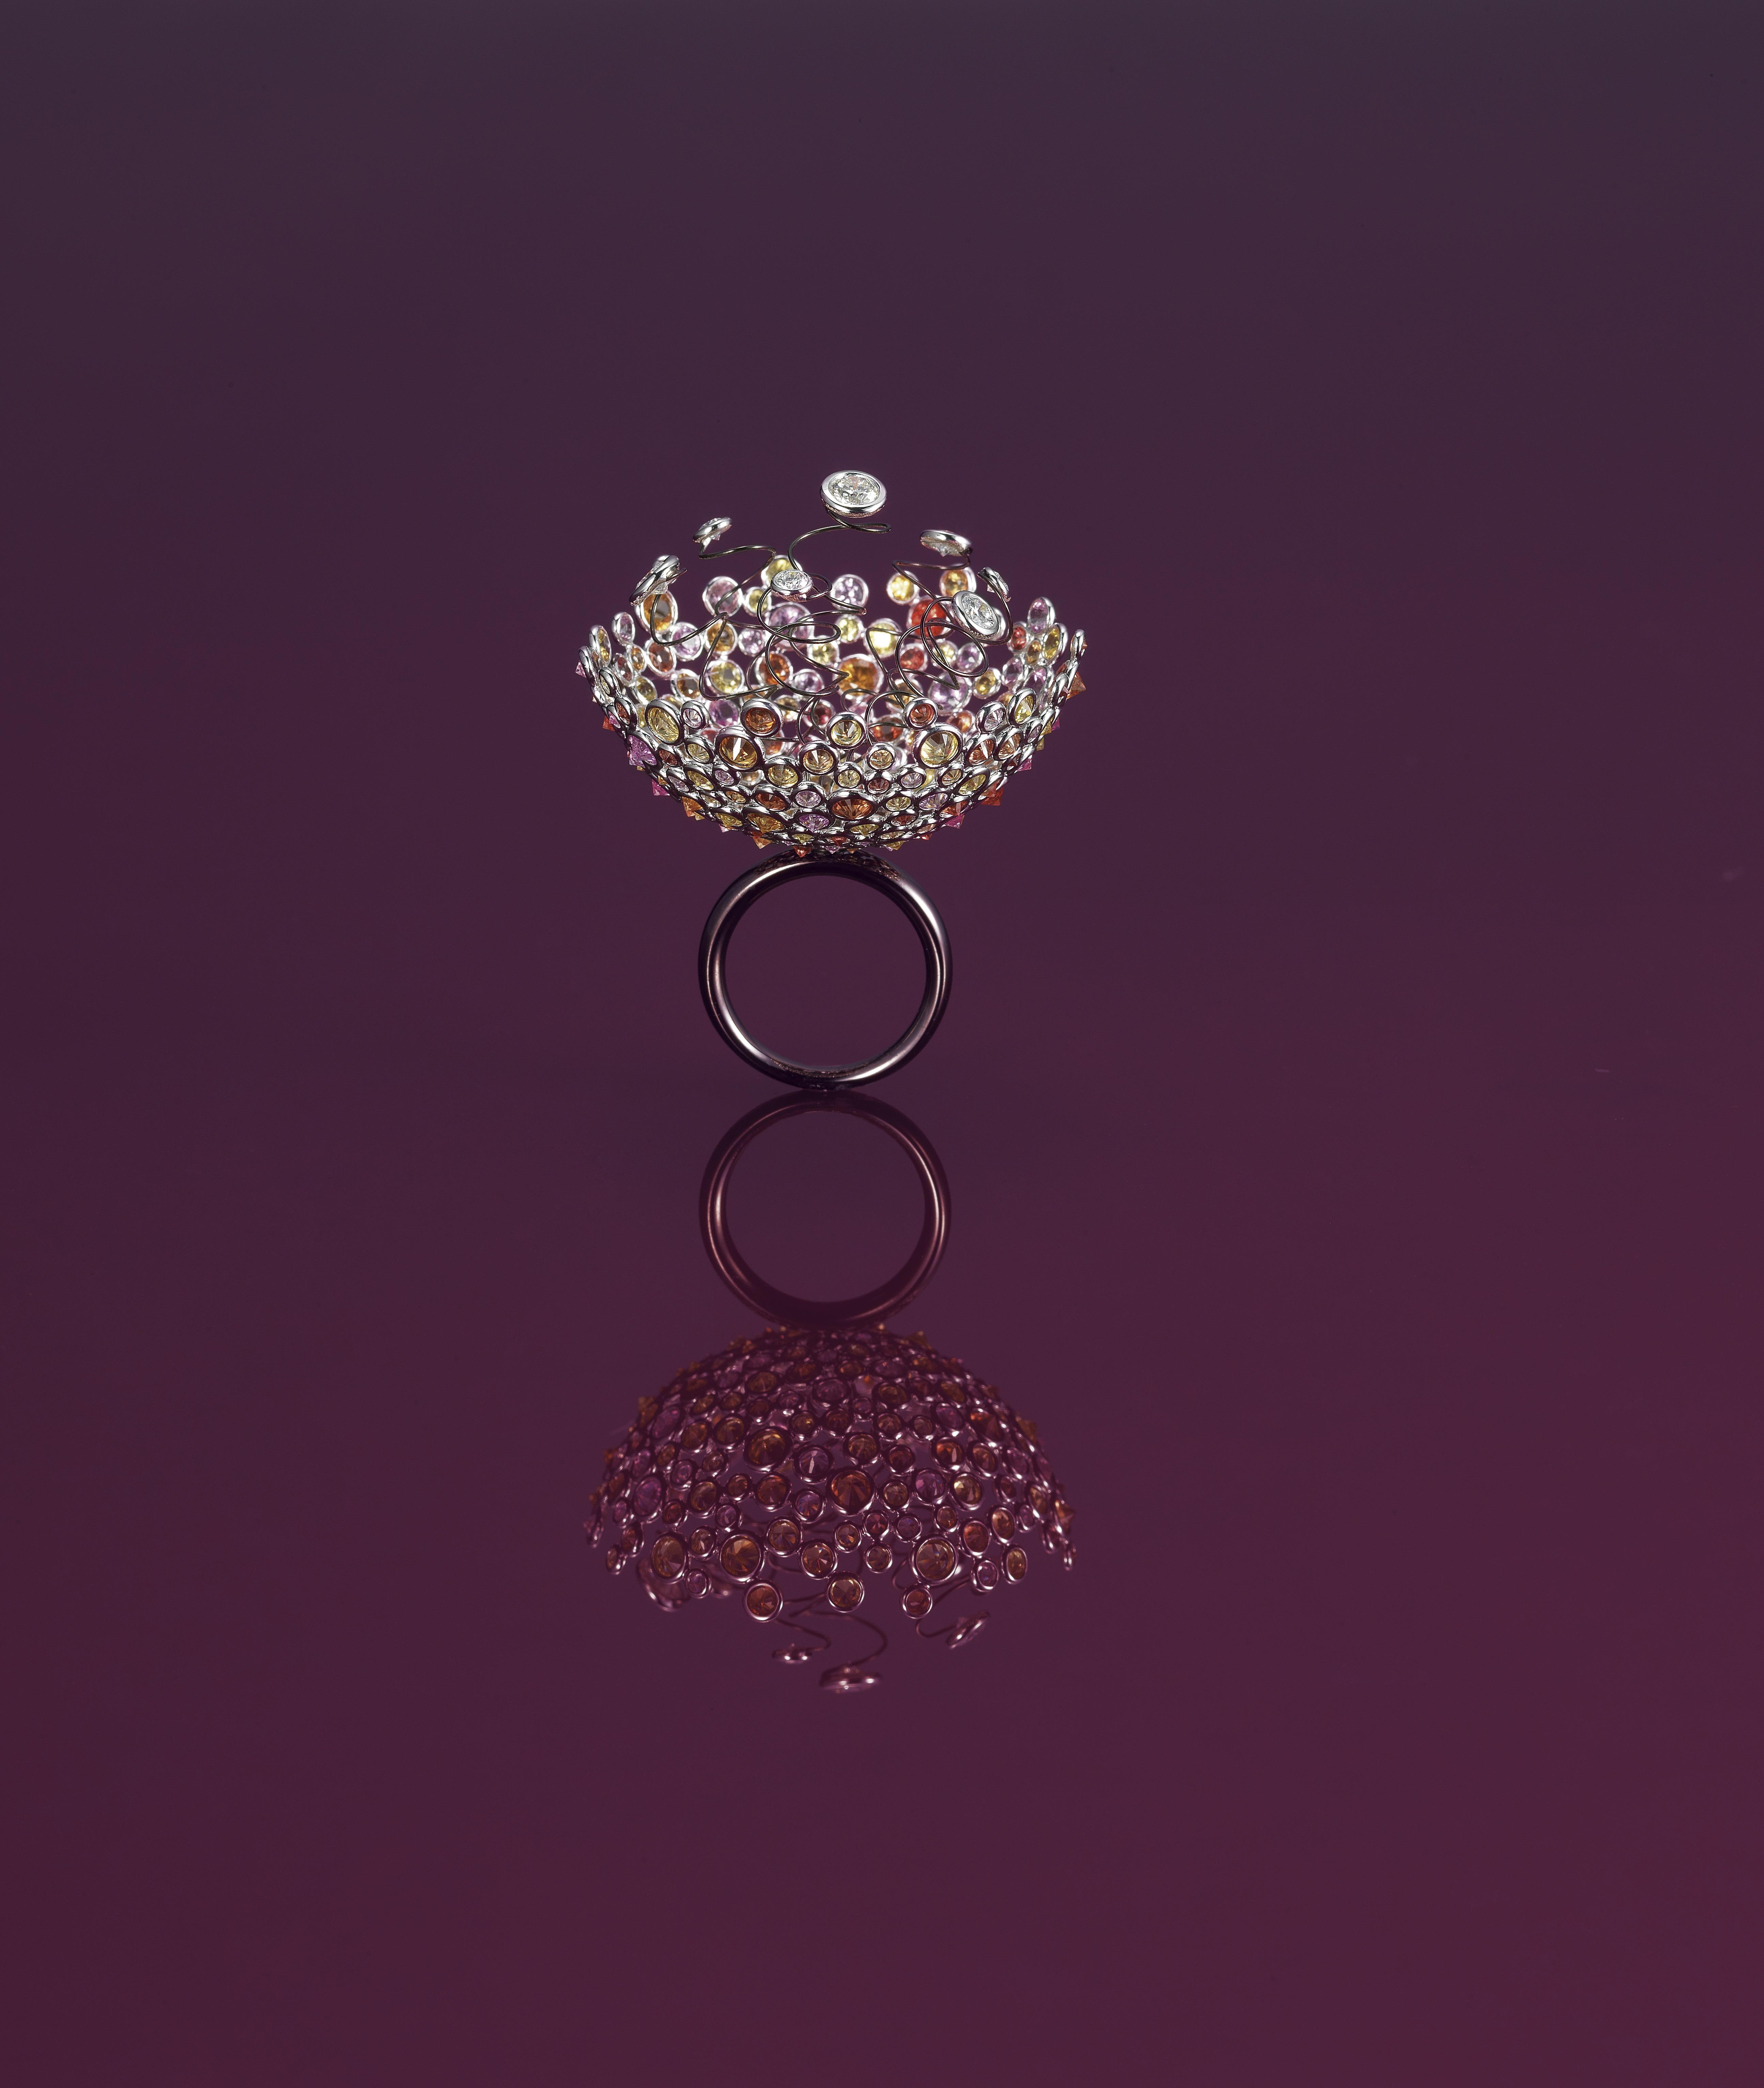 hktdccom Jewellery Design Competition High on Diamond SkybrHong